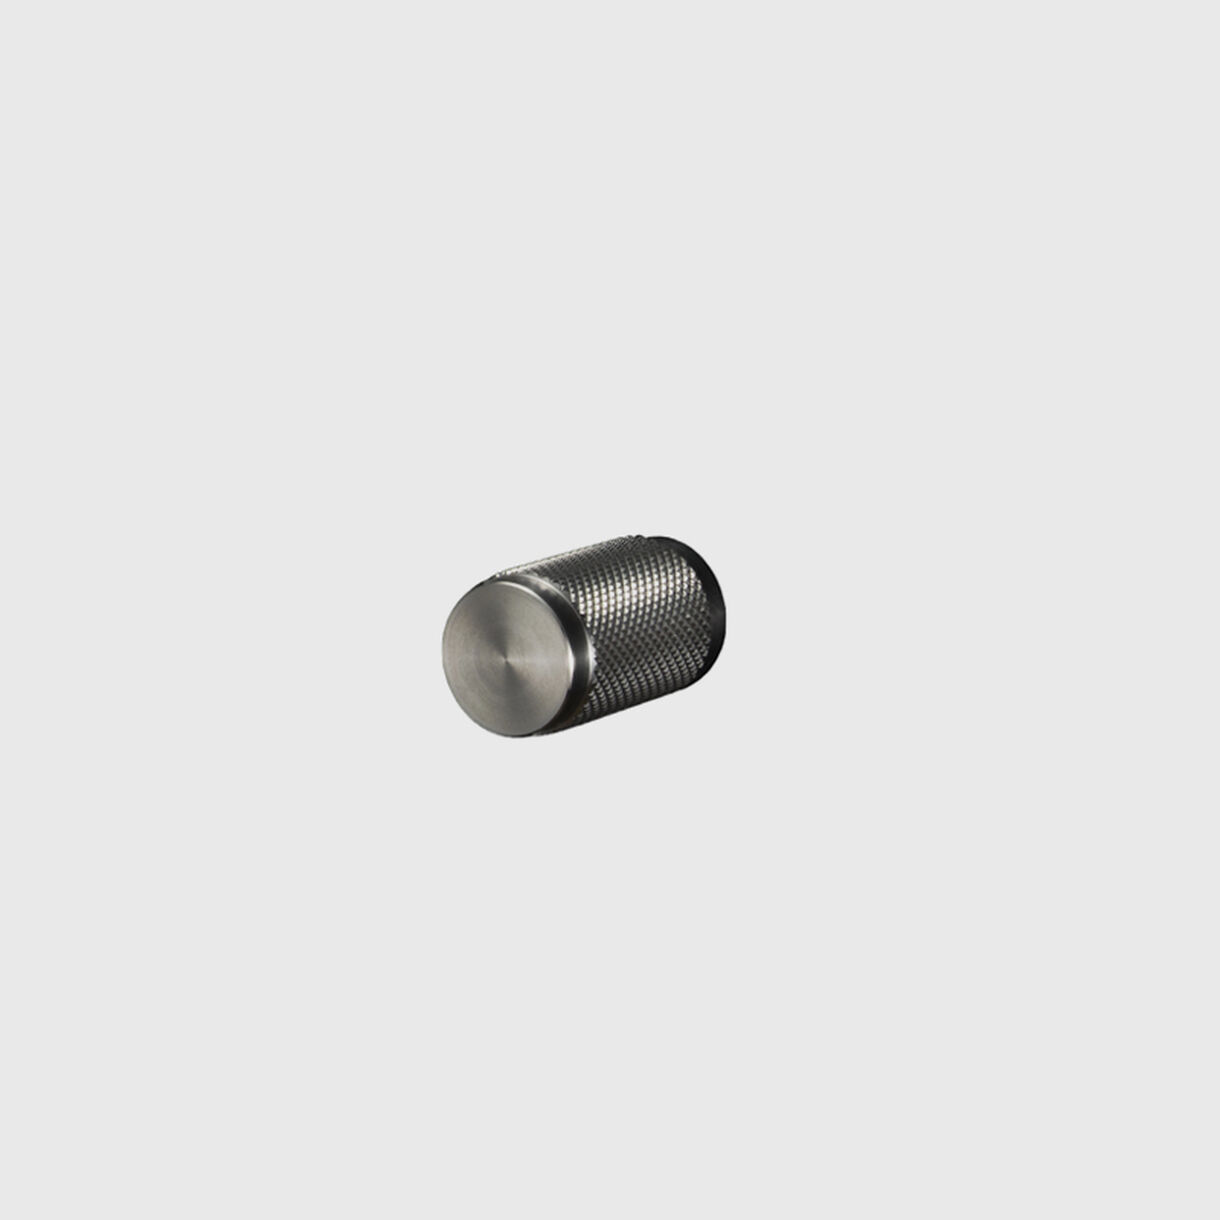 Furniture Knob, Steel